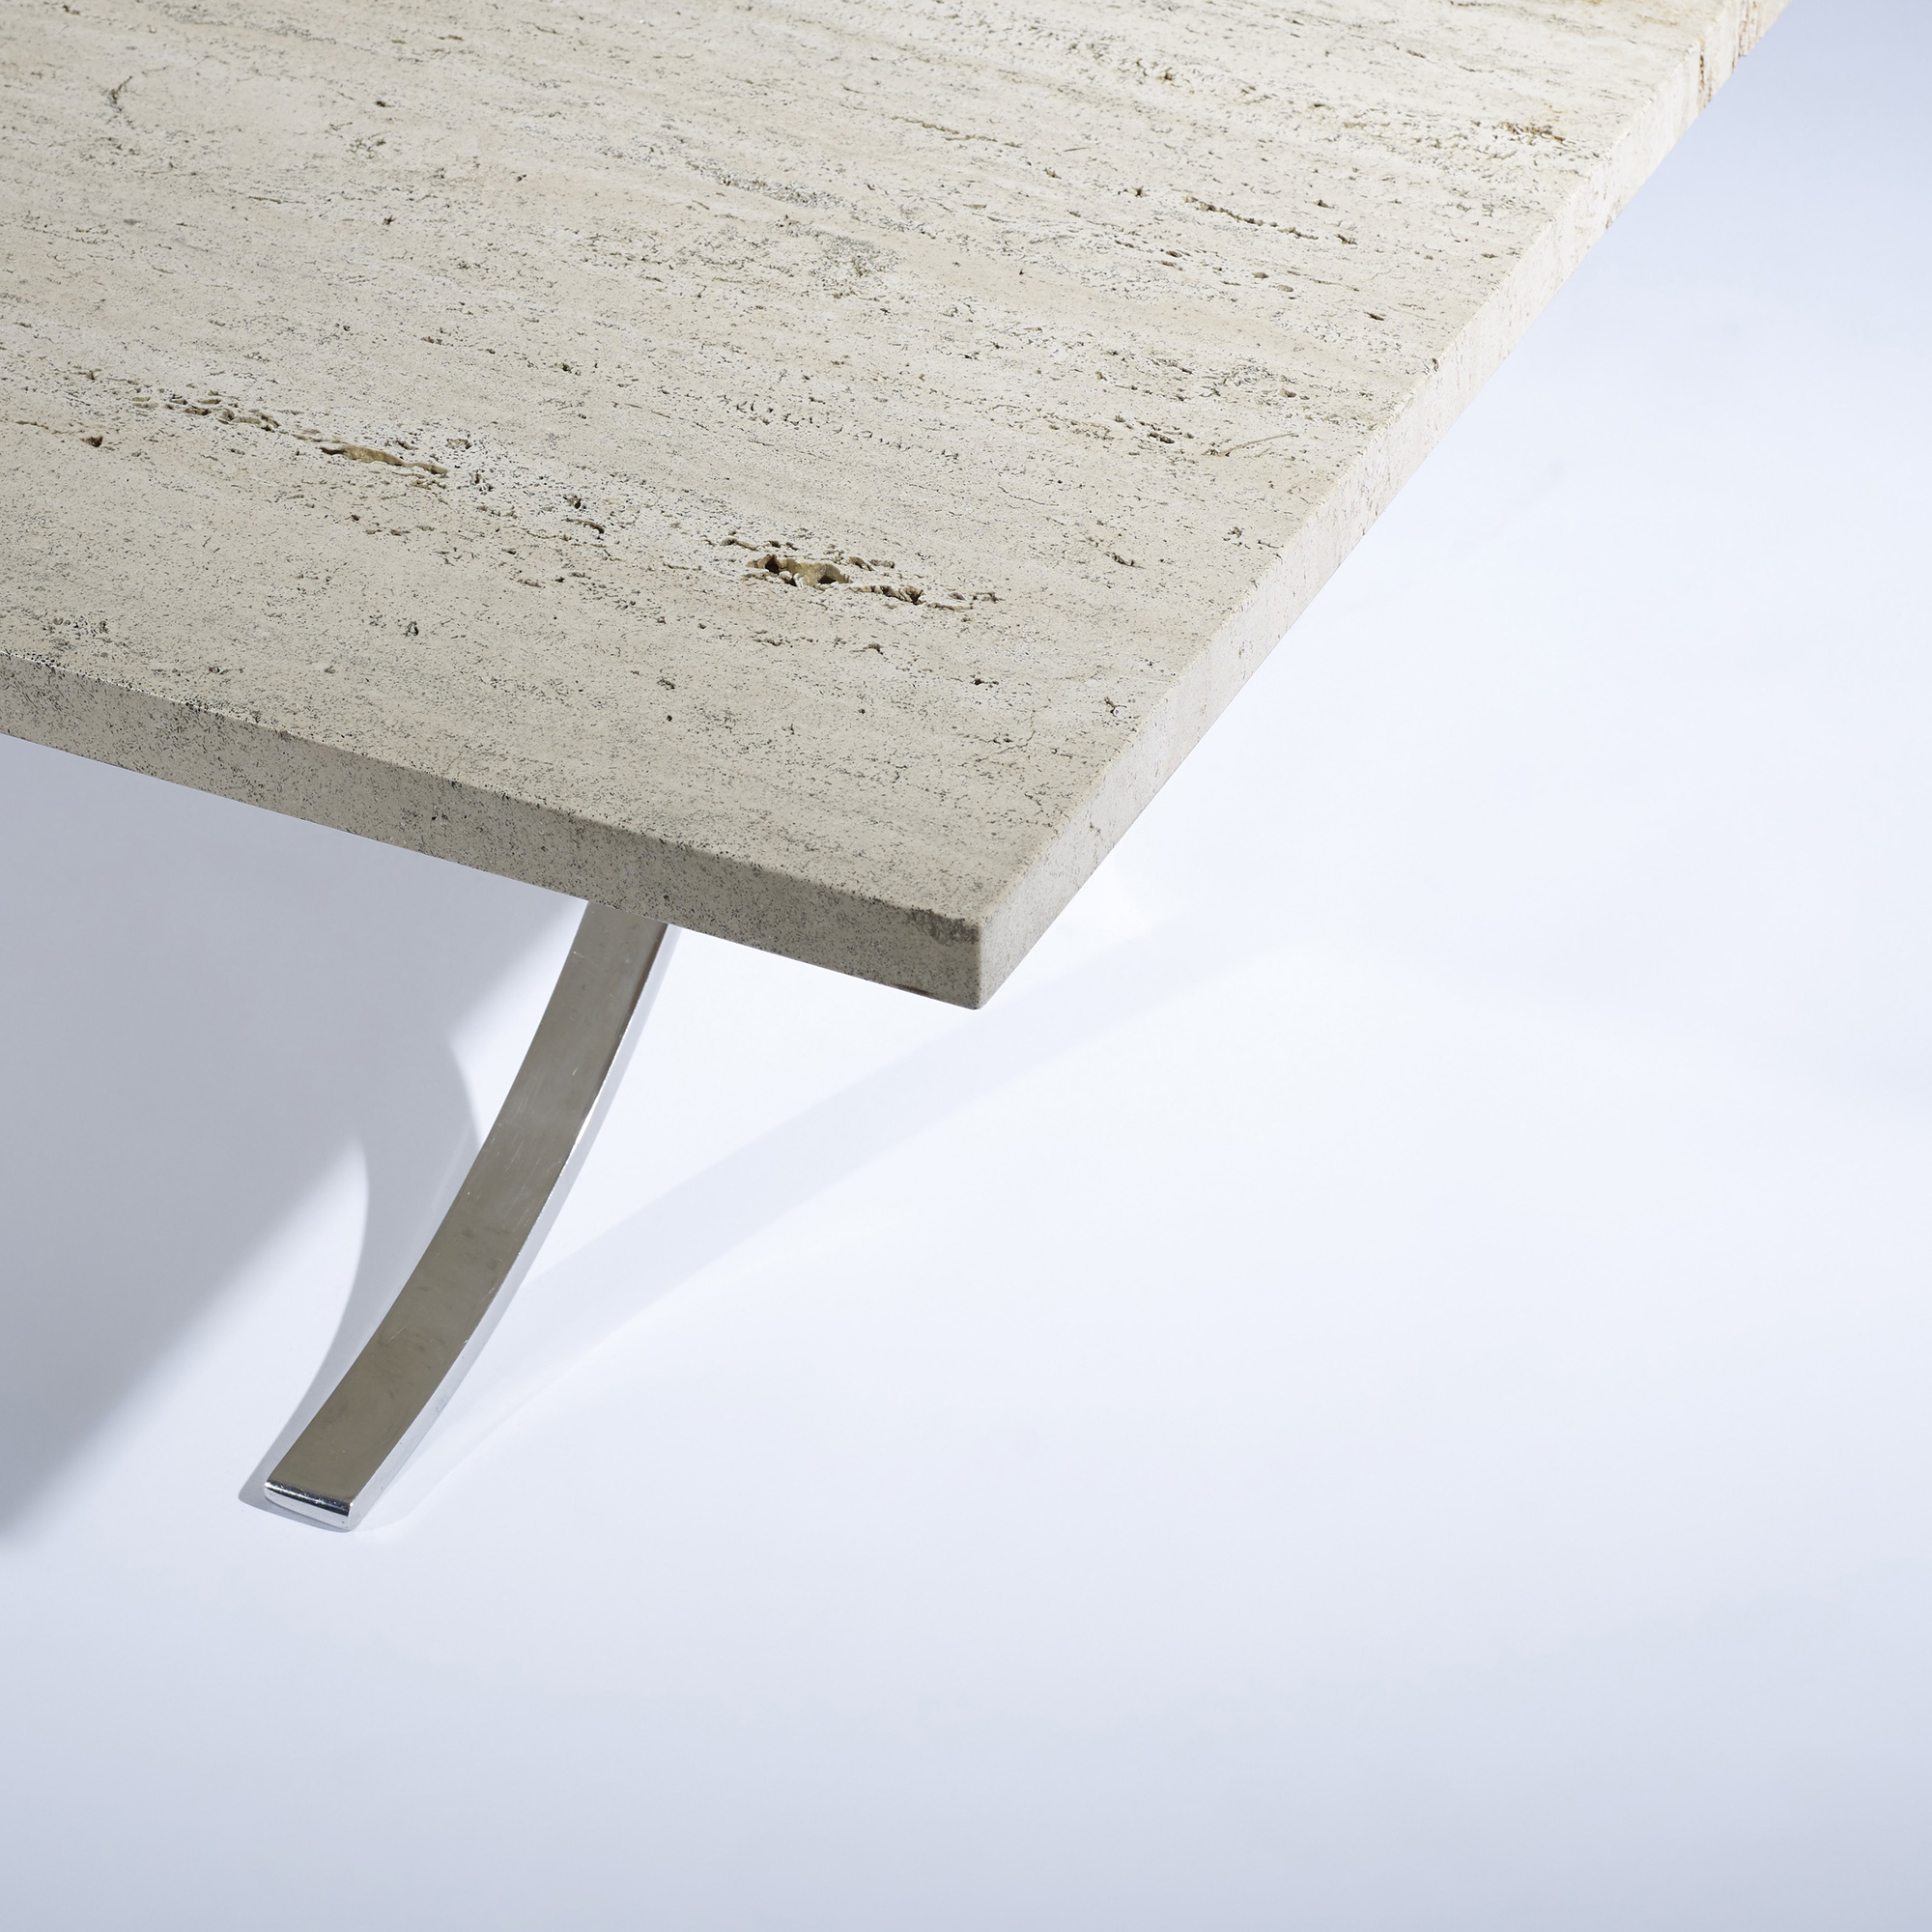 275 Ludwig Mies Van Der Rohe Coffee Table